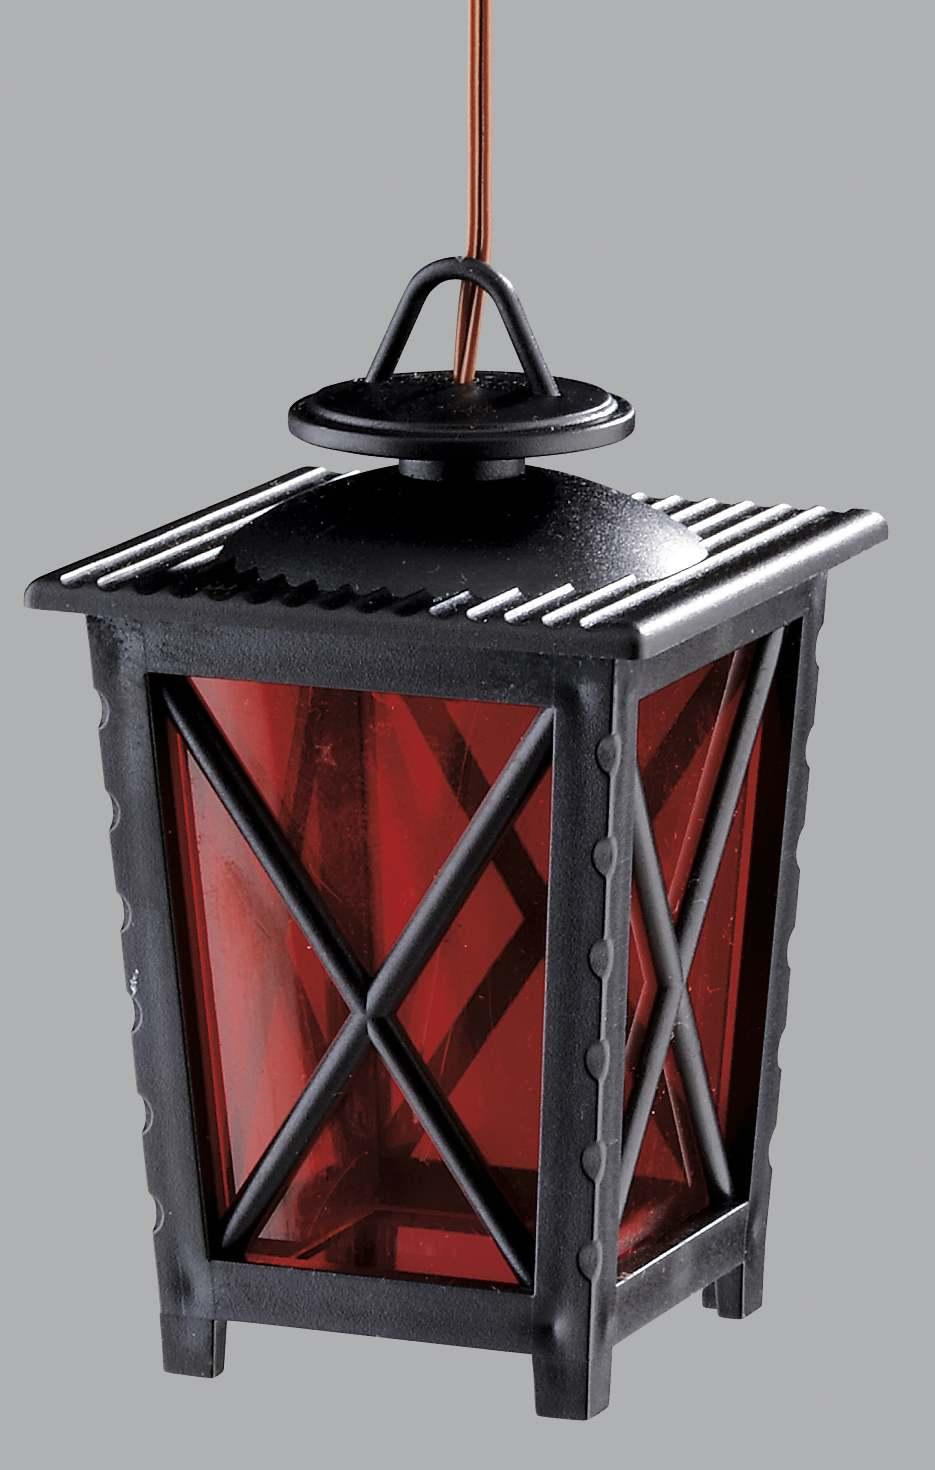 grosse laterne led 3 5v fuer krippenbau modelleisenbahn puppenhaus lampen baumarkt wossiland. Black Bedroom Furniture Sets. Home Design Ideas